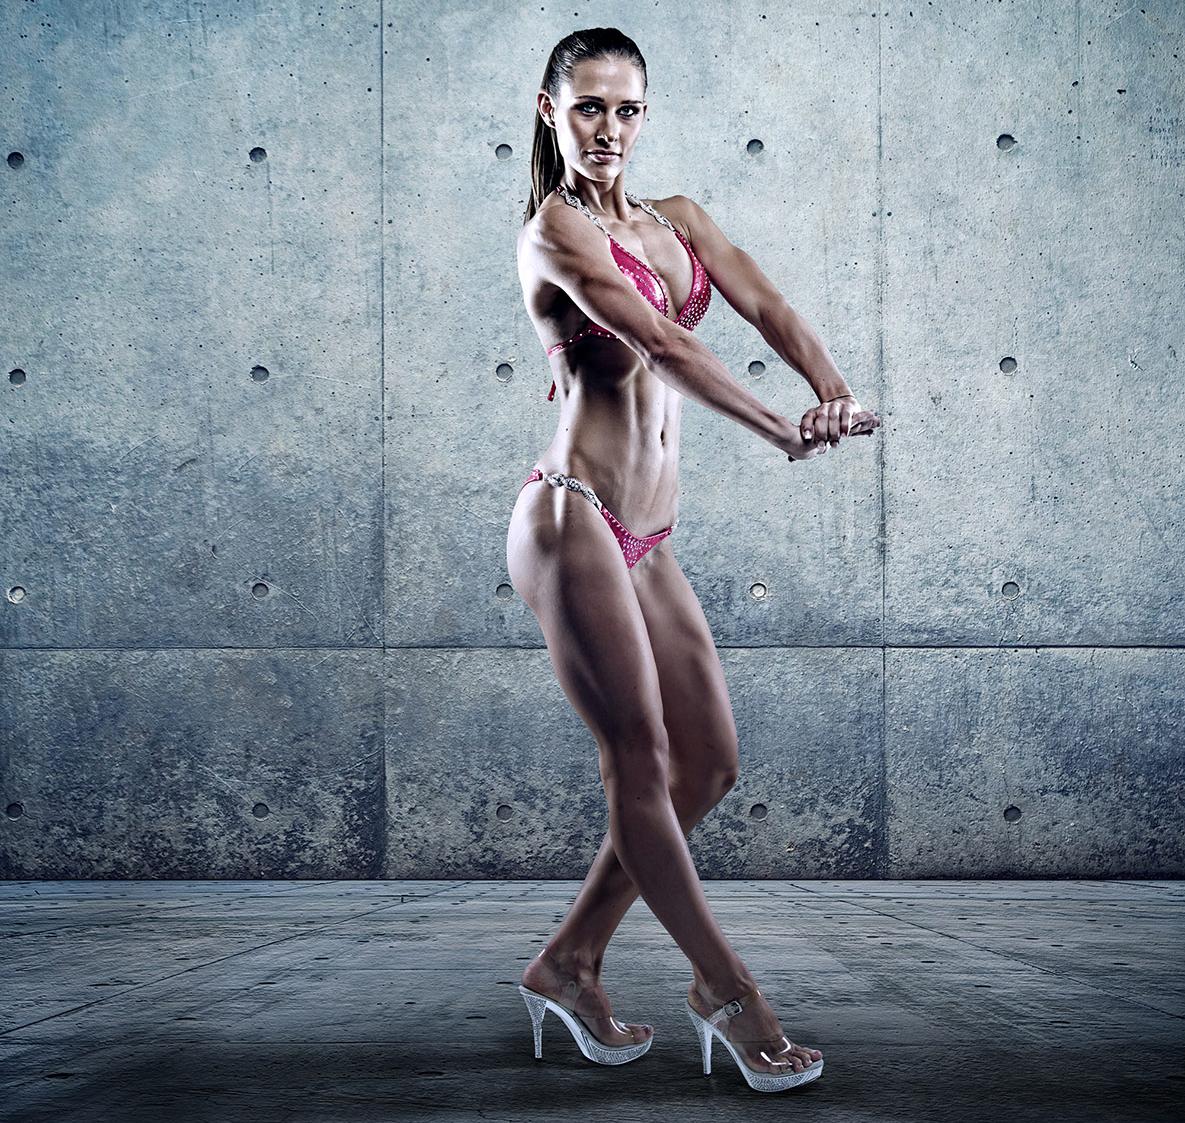 leilani-fitness-photography-gritty-concrete-brandon-barnard-professional-photographer.jpg